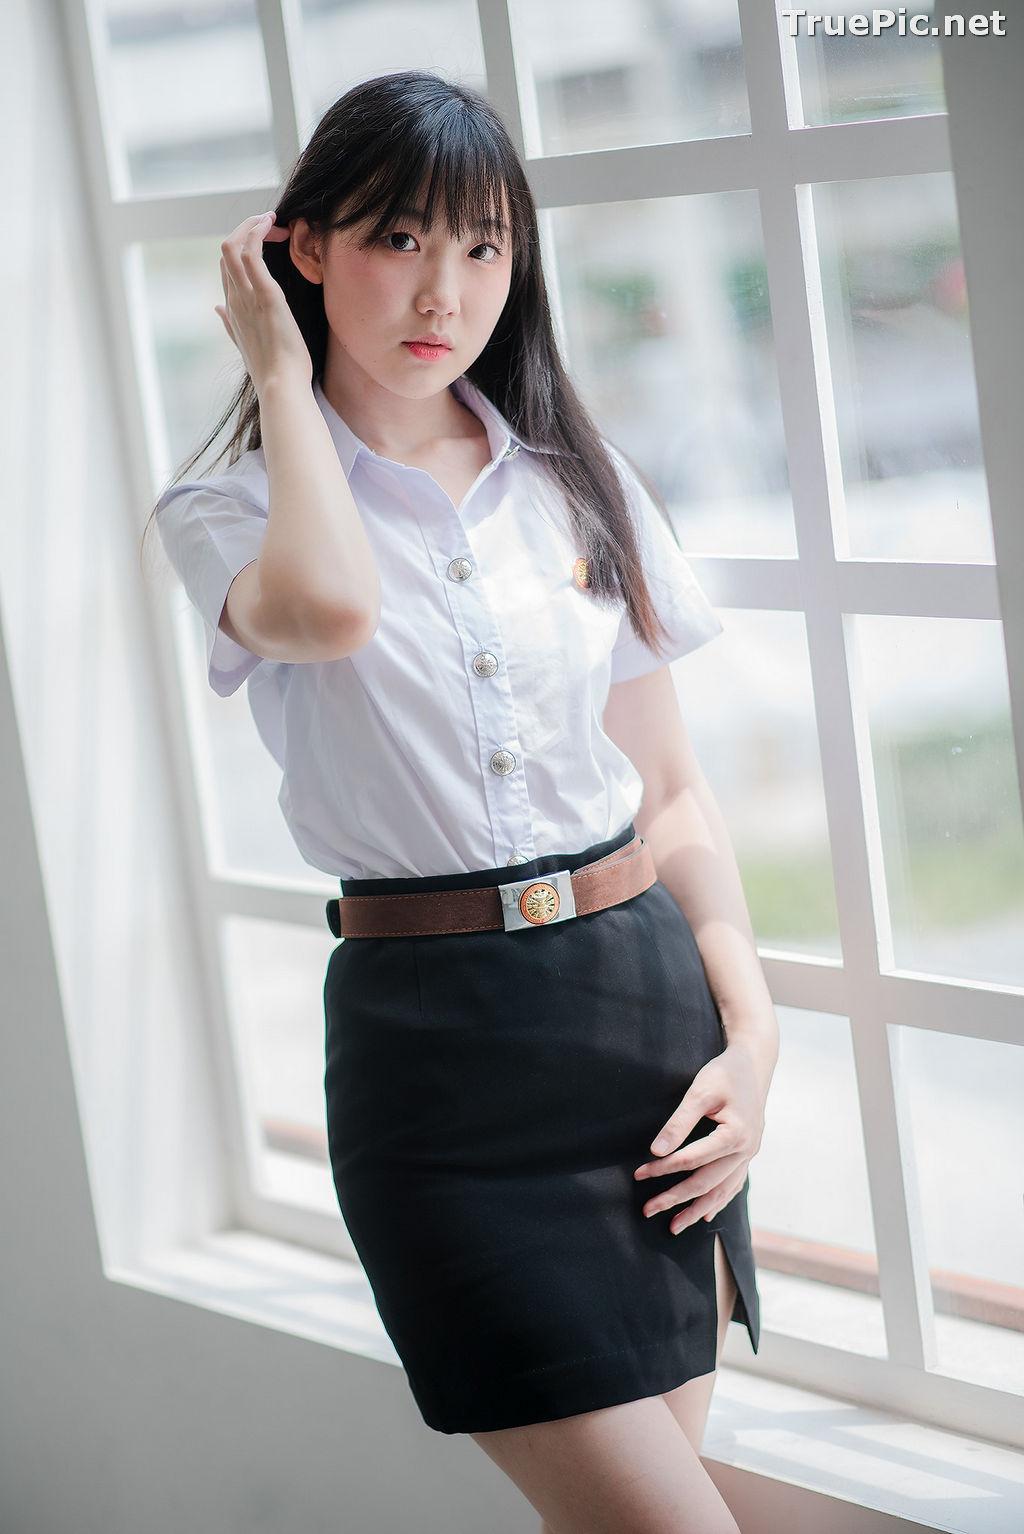 Image Thailand Model - Miki Ariyathanakit - Cute Student Girl - TruePic.net - Picture-7